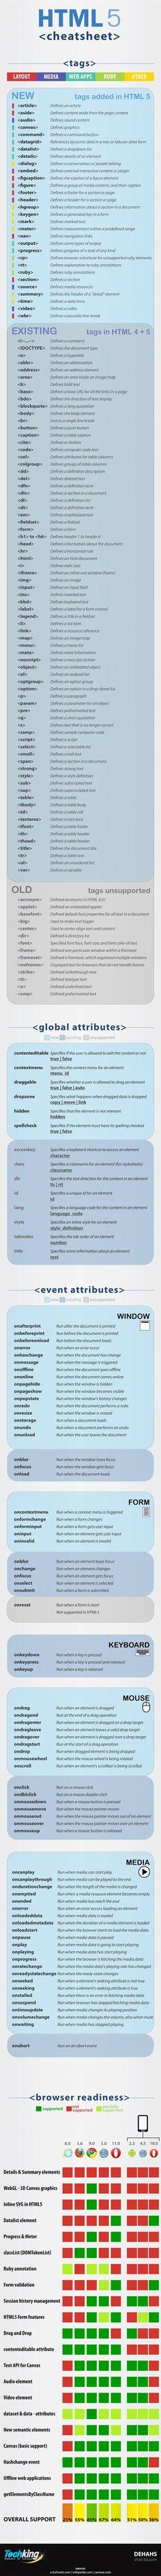 http://www.creativosonline.org/blog/chuleta-con-herramientas-para-html5.html